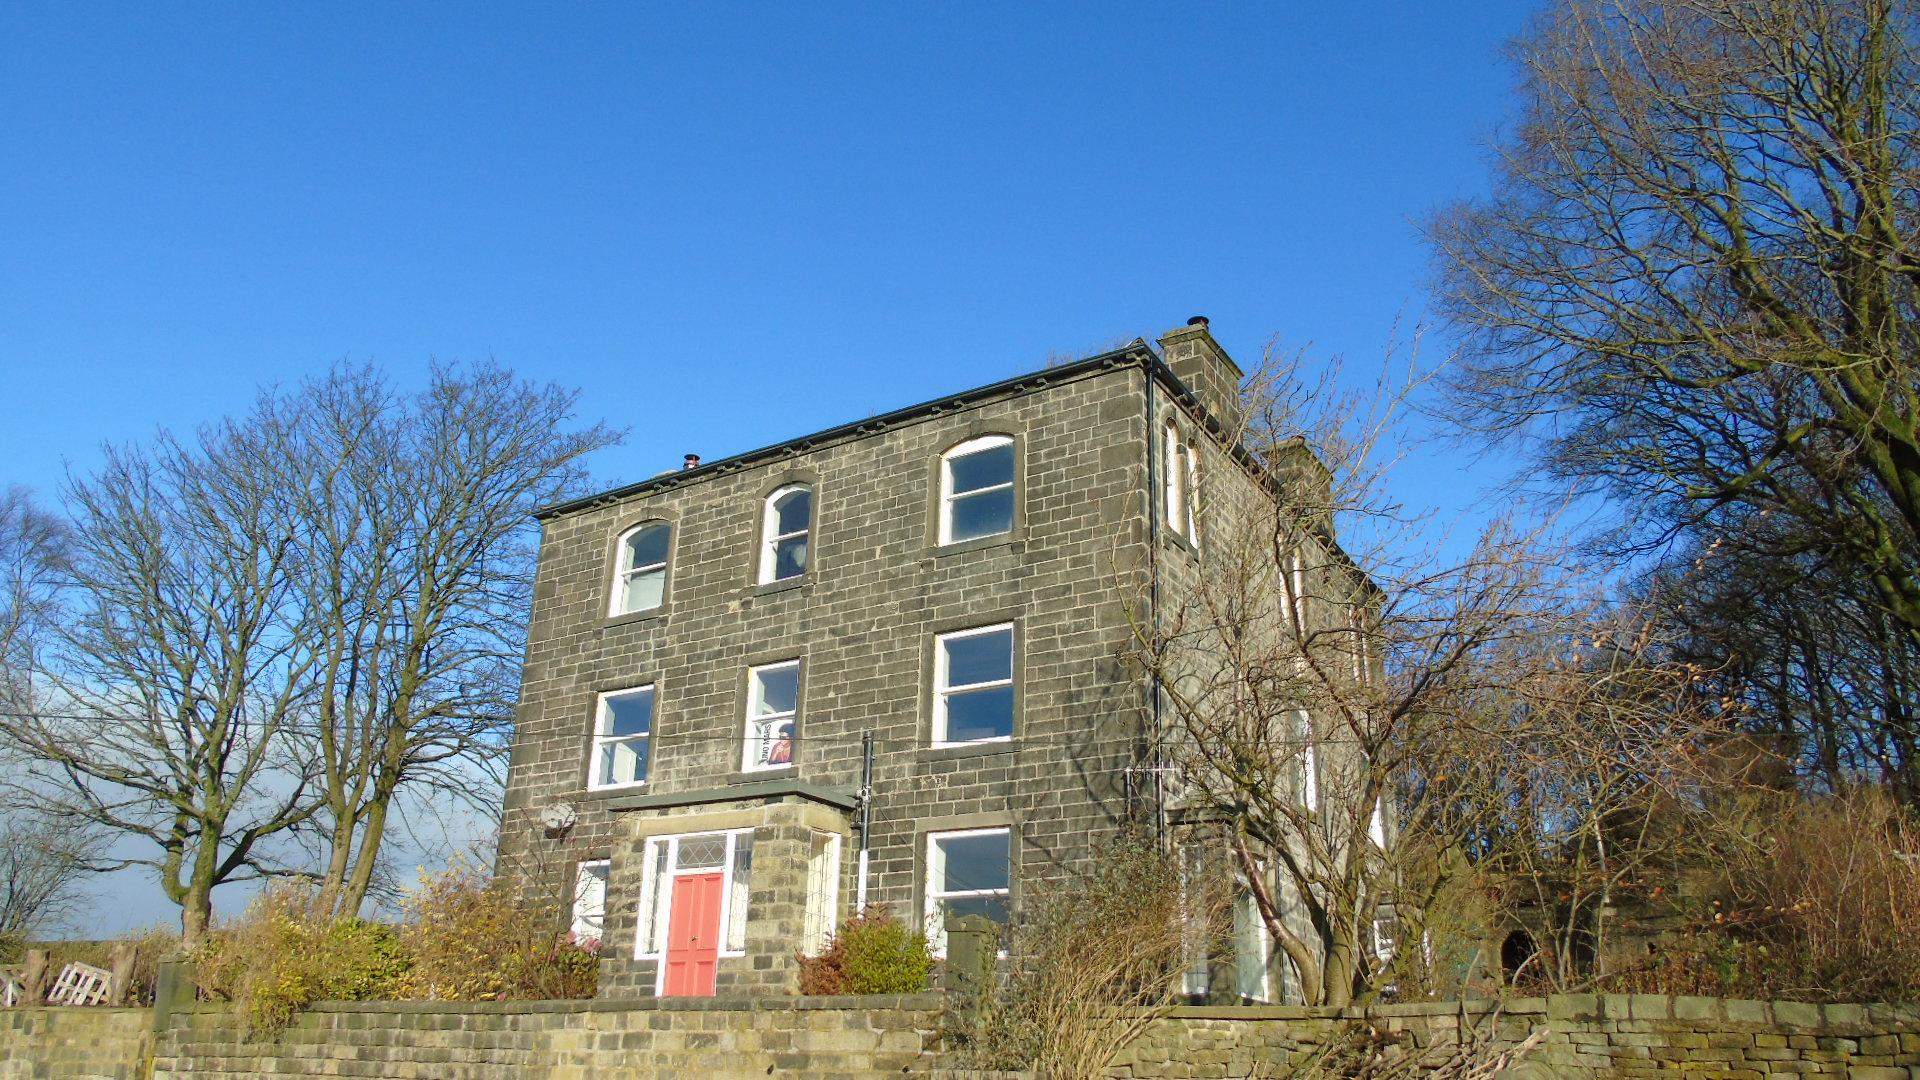 6 bedroom detached house Under Offer in Hebden Bridge - Property photograph